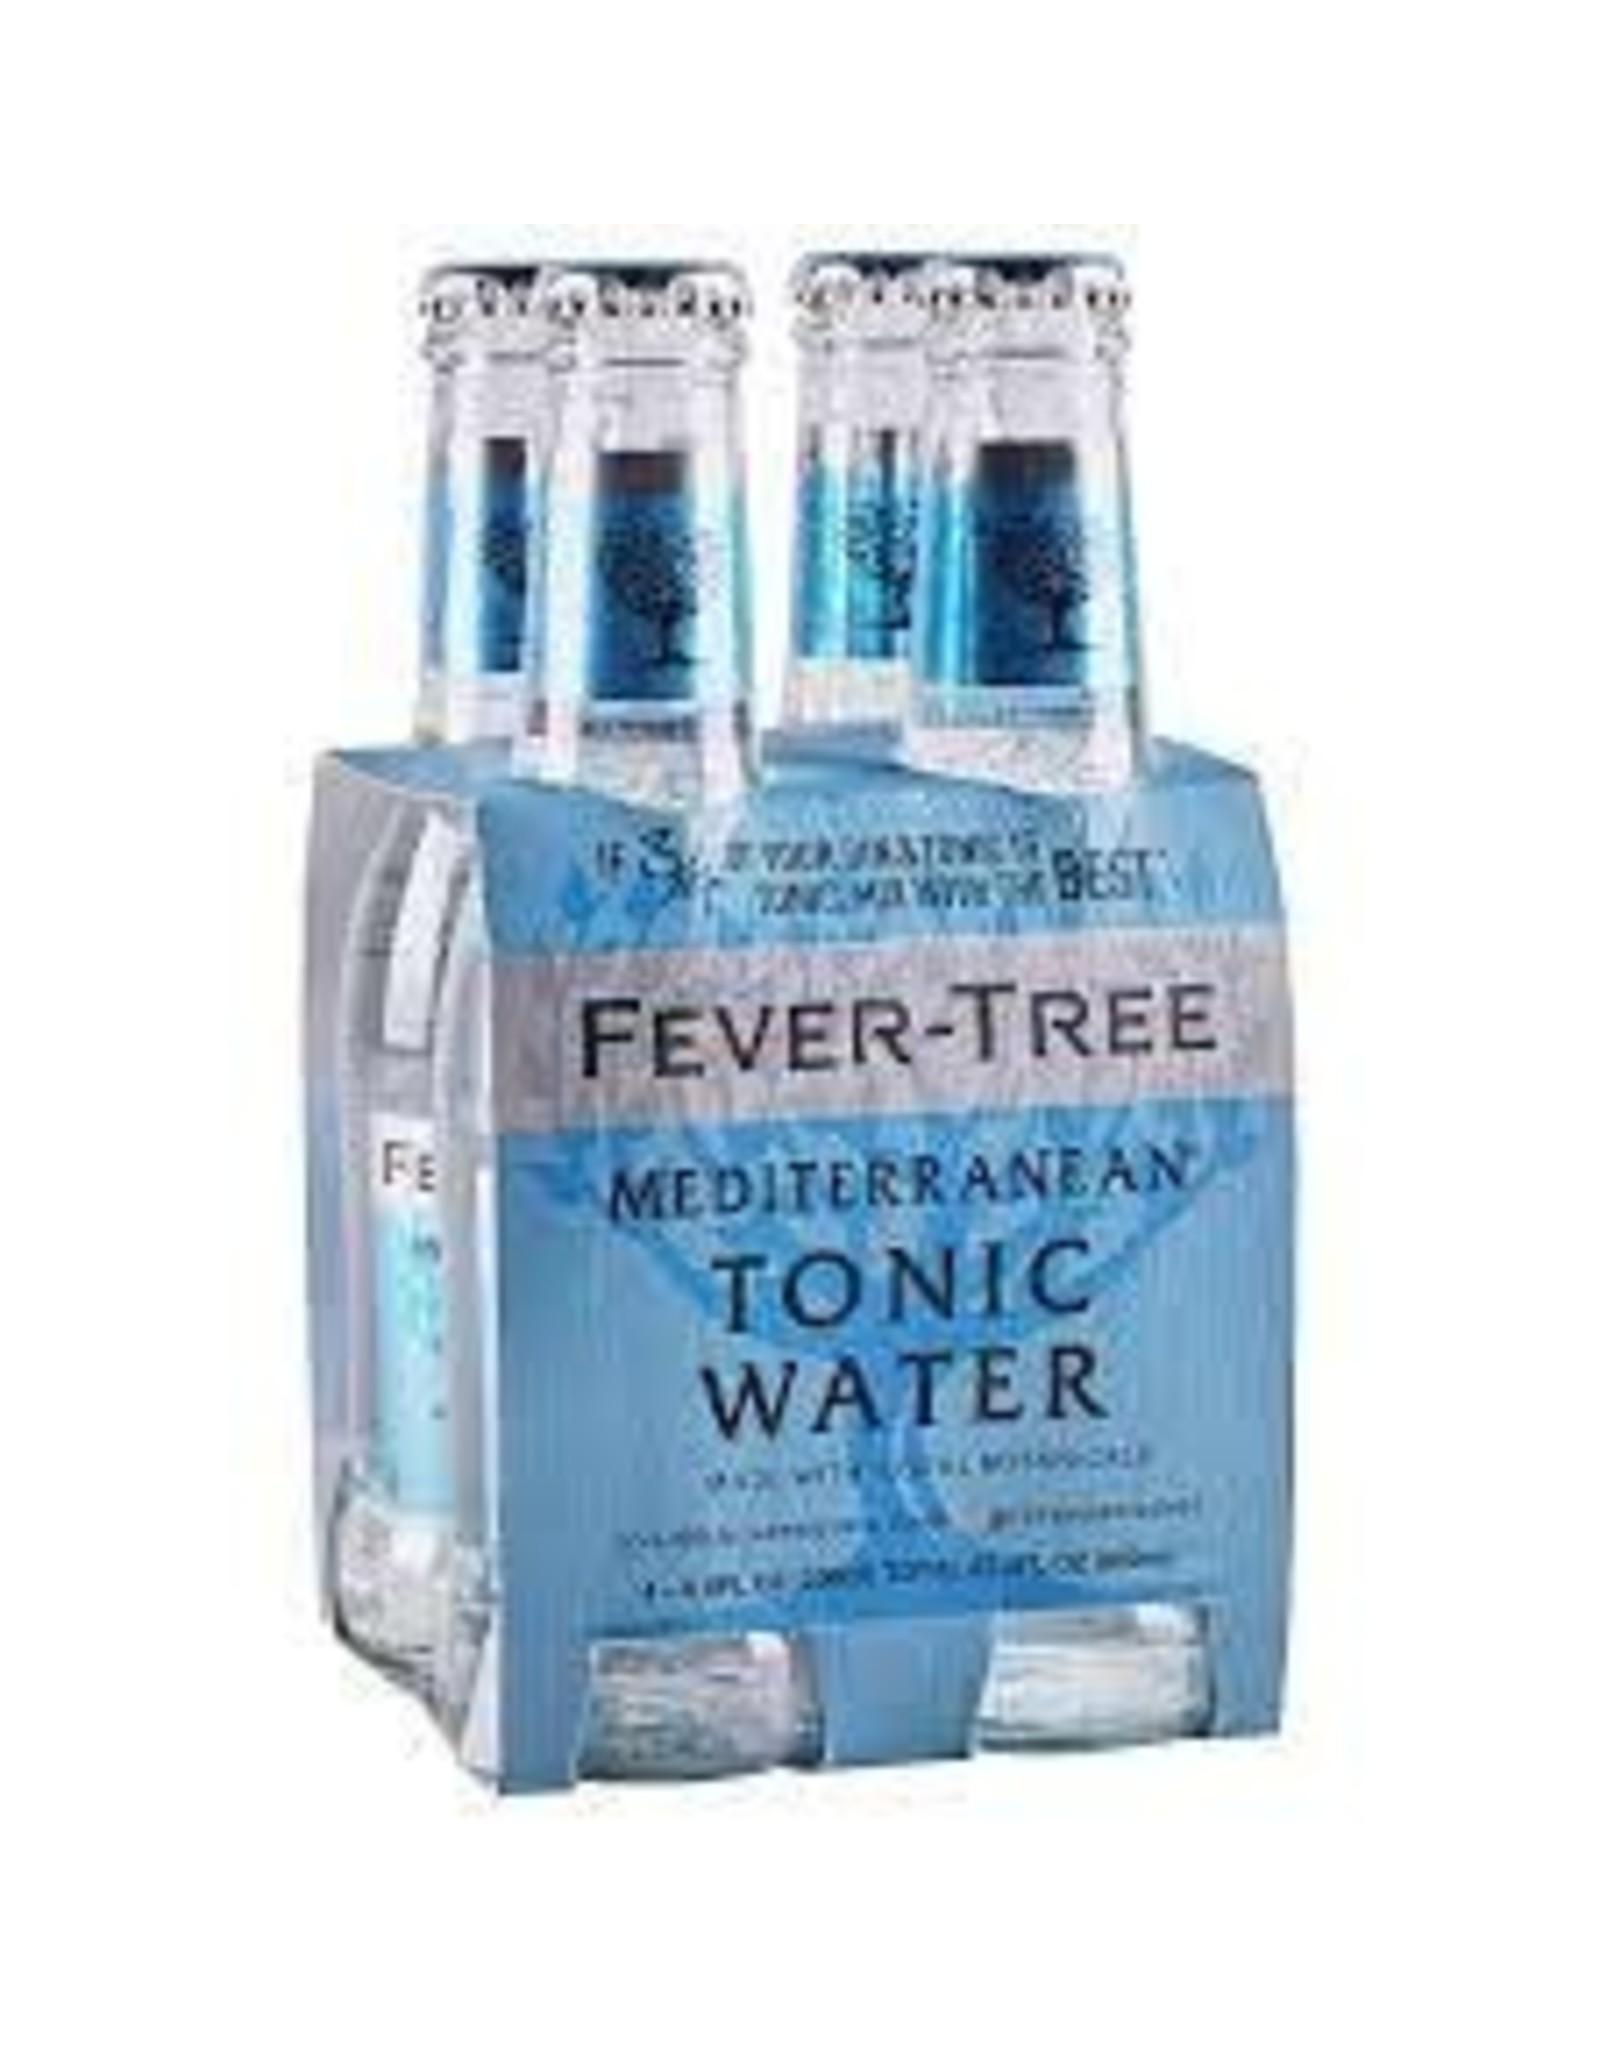 FEVER TREE MEDITERRANEAN TONIC WATER 4PK